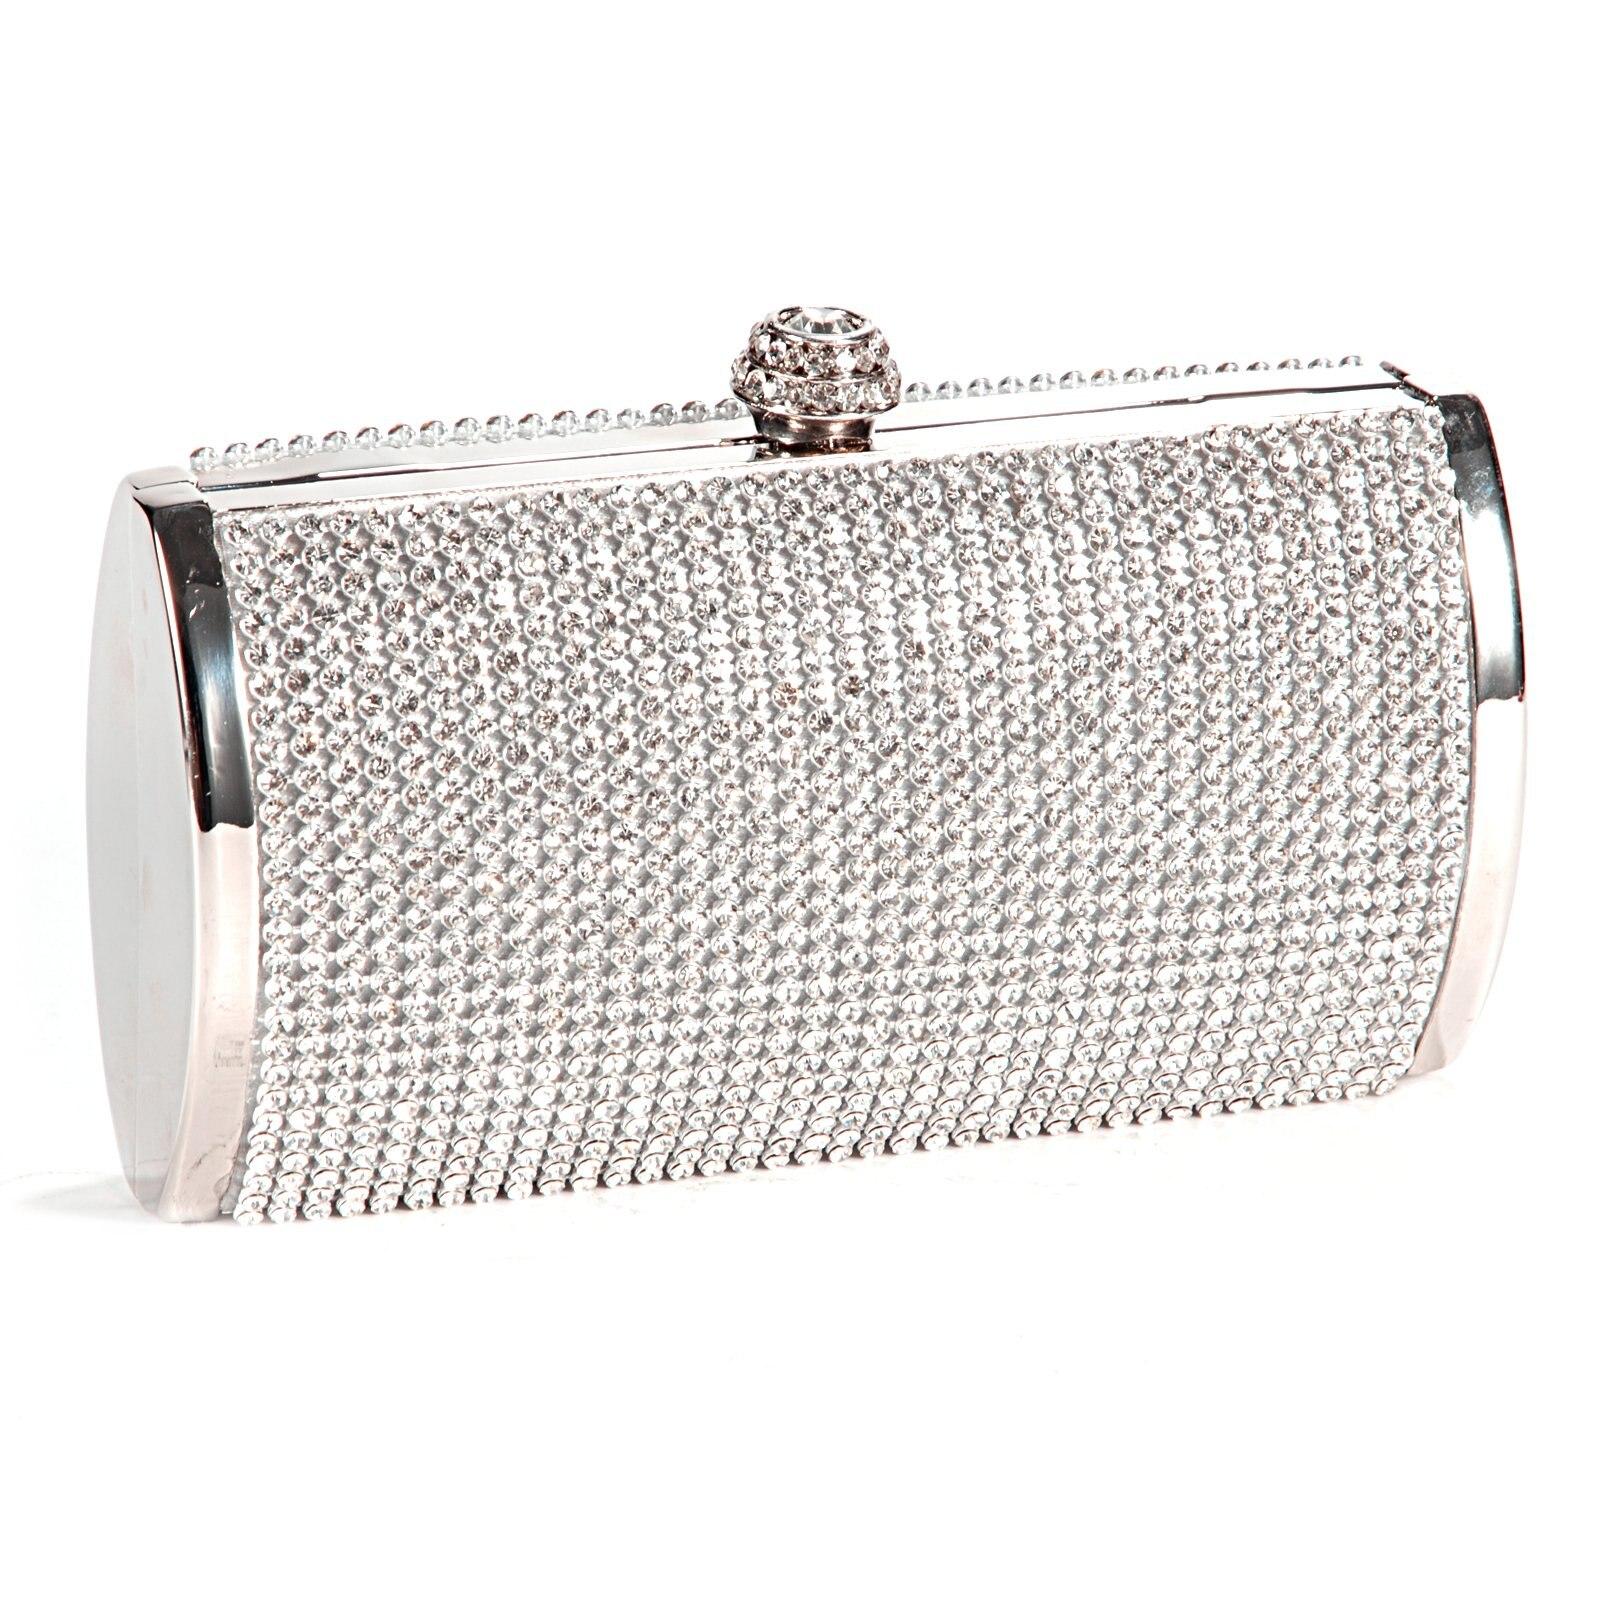 5pcs( ABDB Handbag Pouch Wallet Rigid Metallic Deco Rhinestones for Woman Girl Silvery5pcs( ABDB Handbag Pouch Wallet Rigid Metallic Deco Rhinestones for Woman Girl Silvery